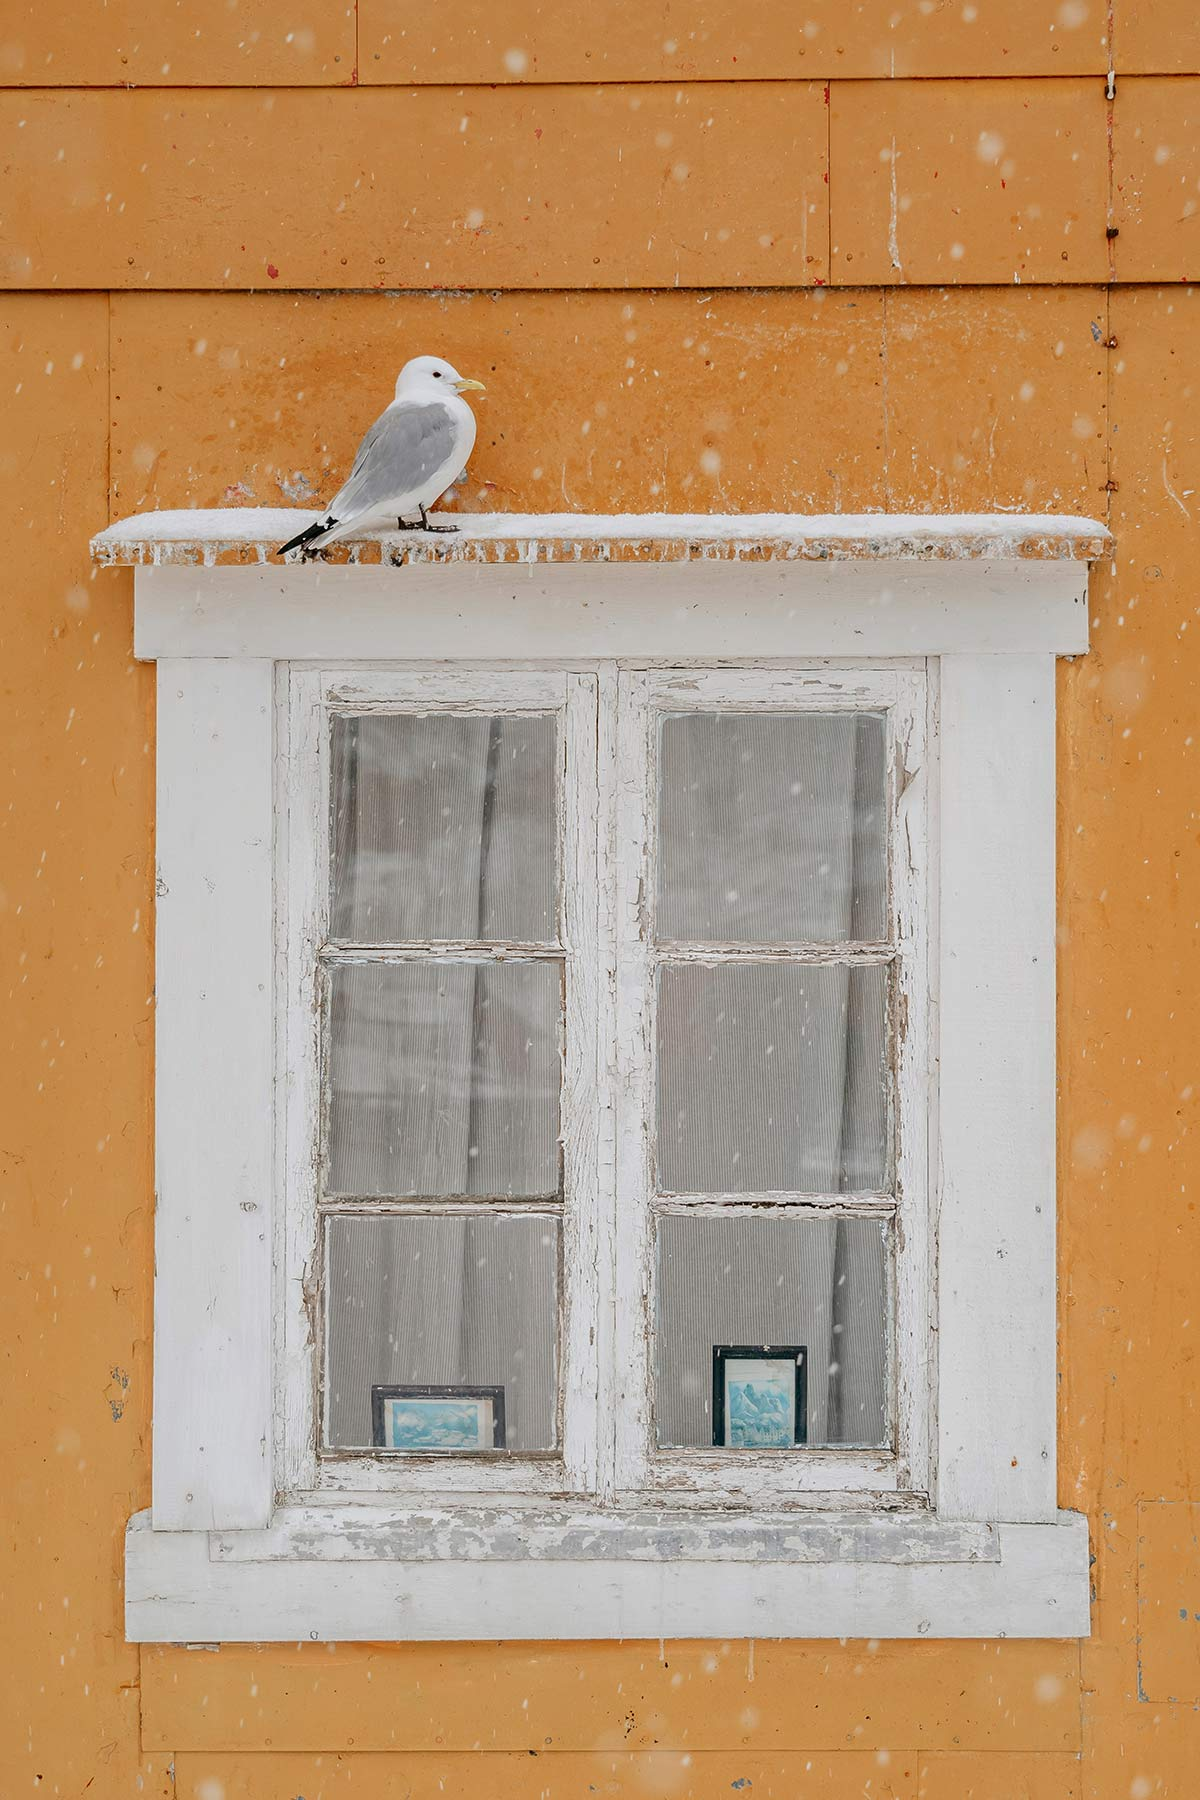 Fenster mit Moewe